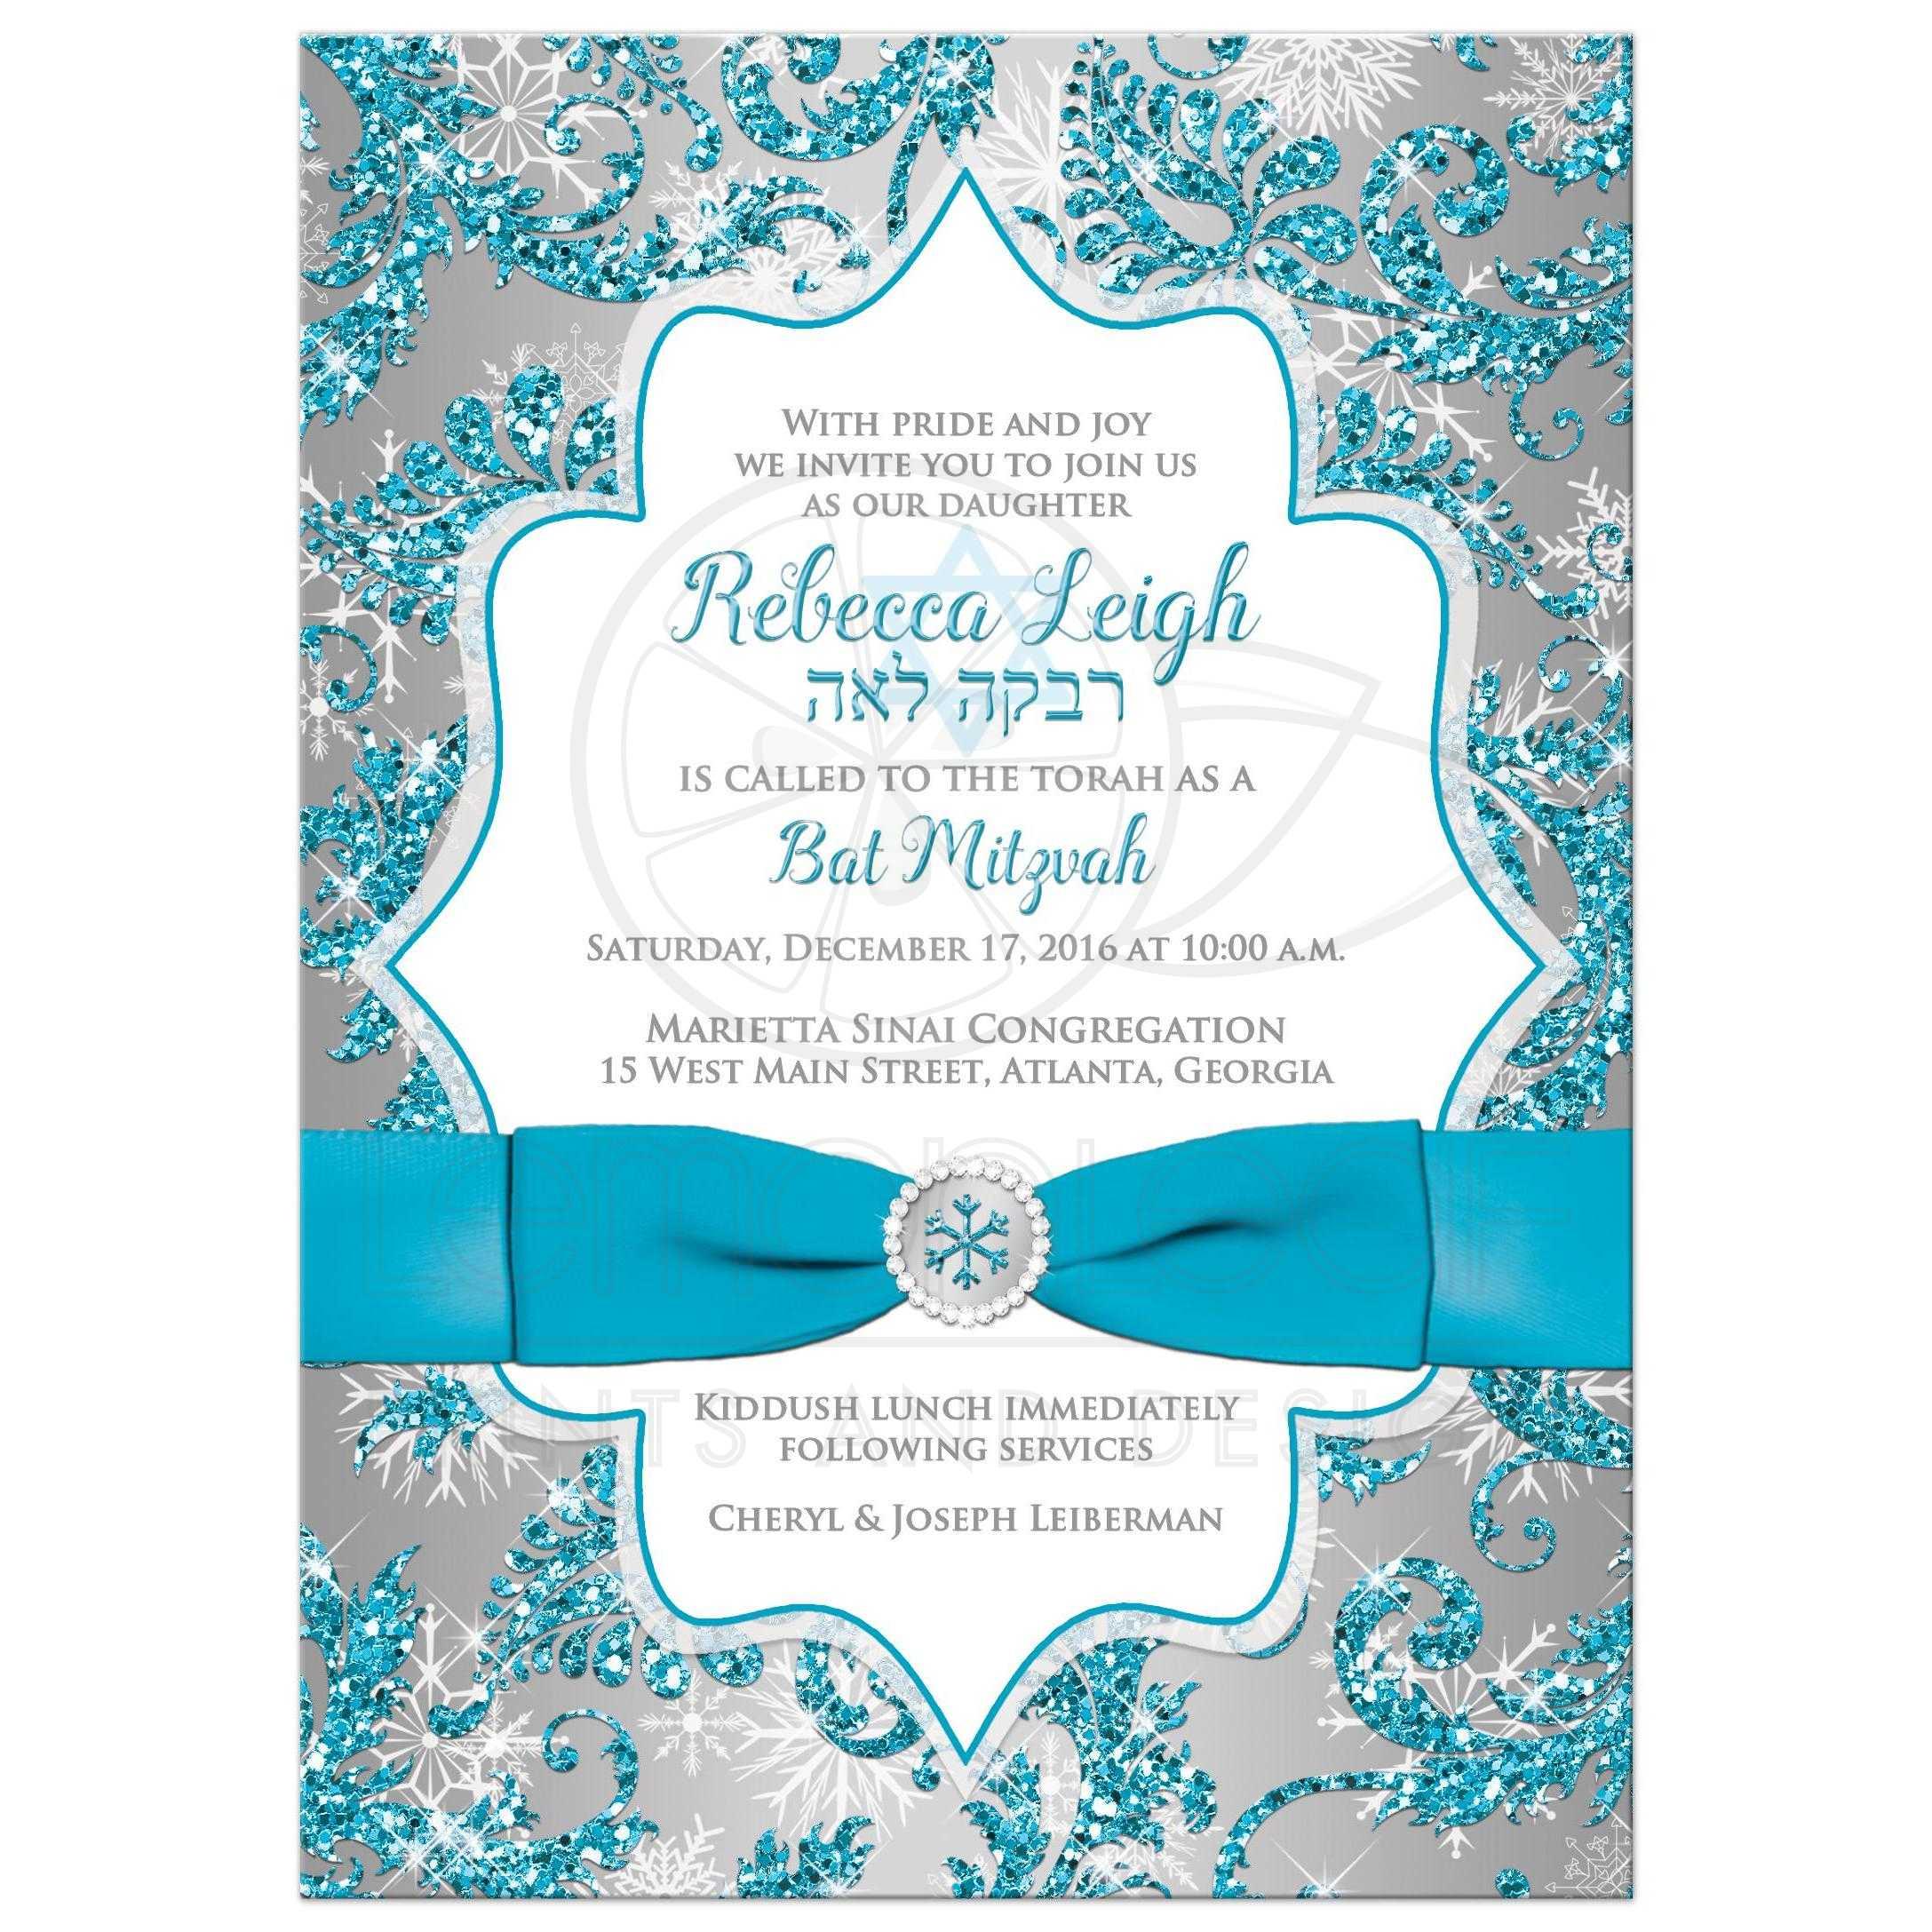 Sweet 16 Photo Invitation Cards for nice invitations sample